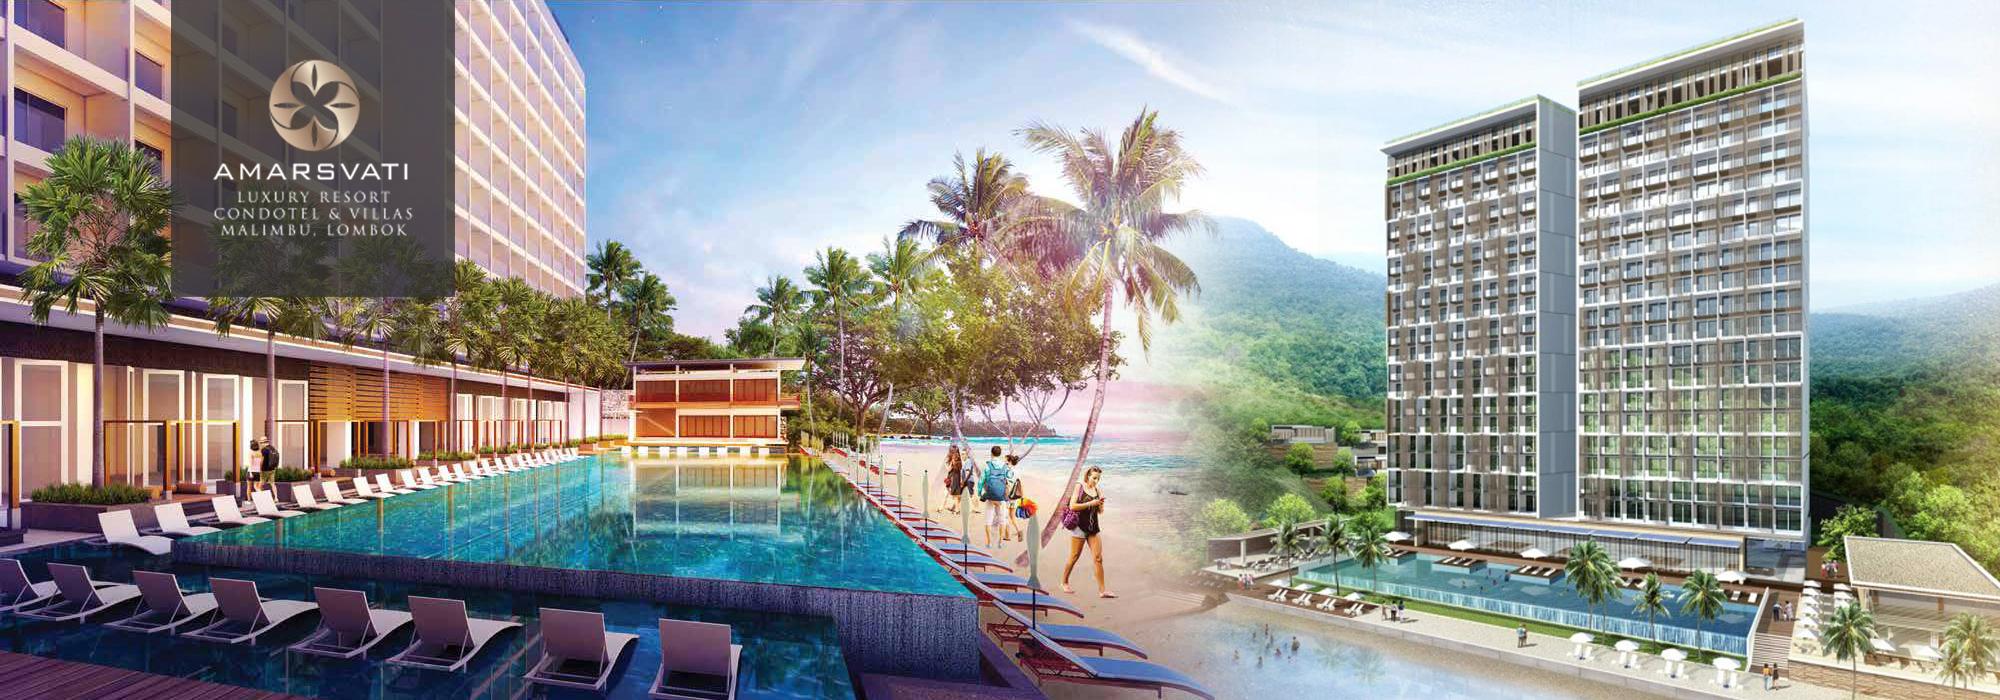 Amarsvati Resort & Condotel